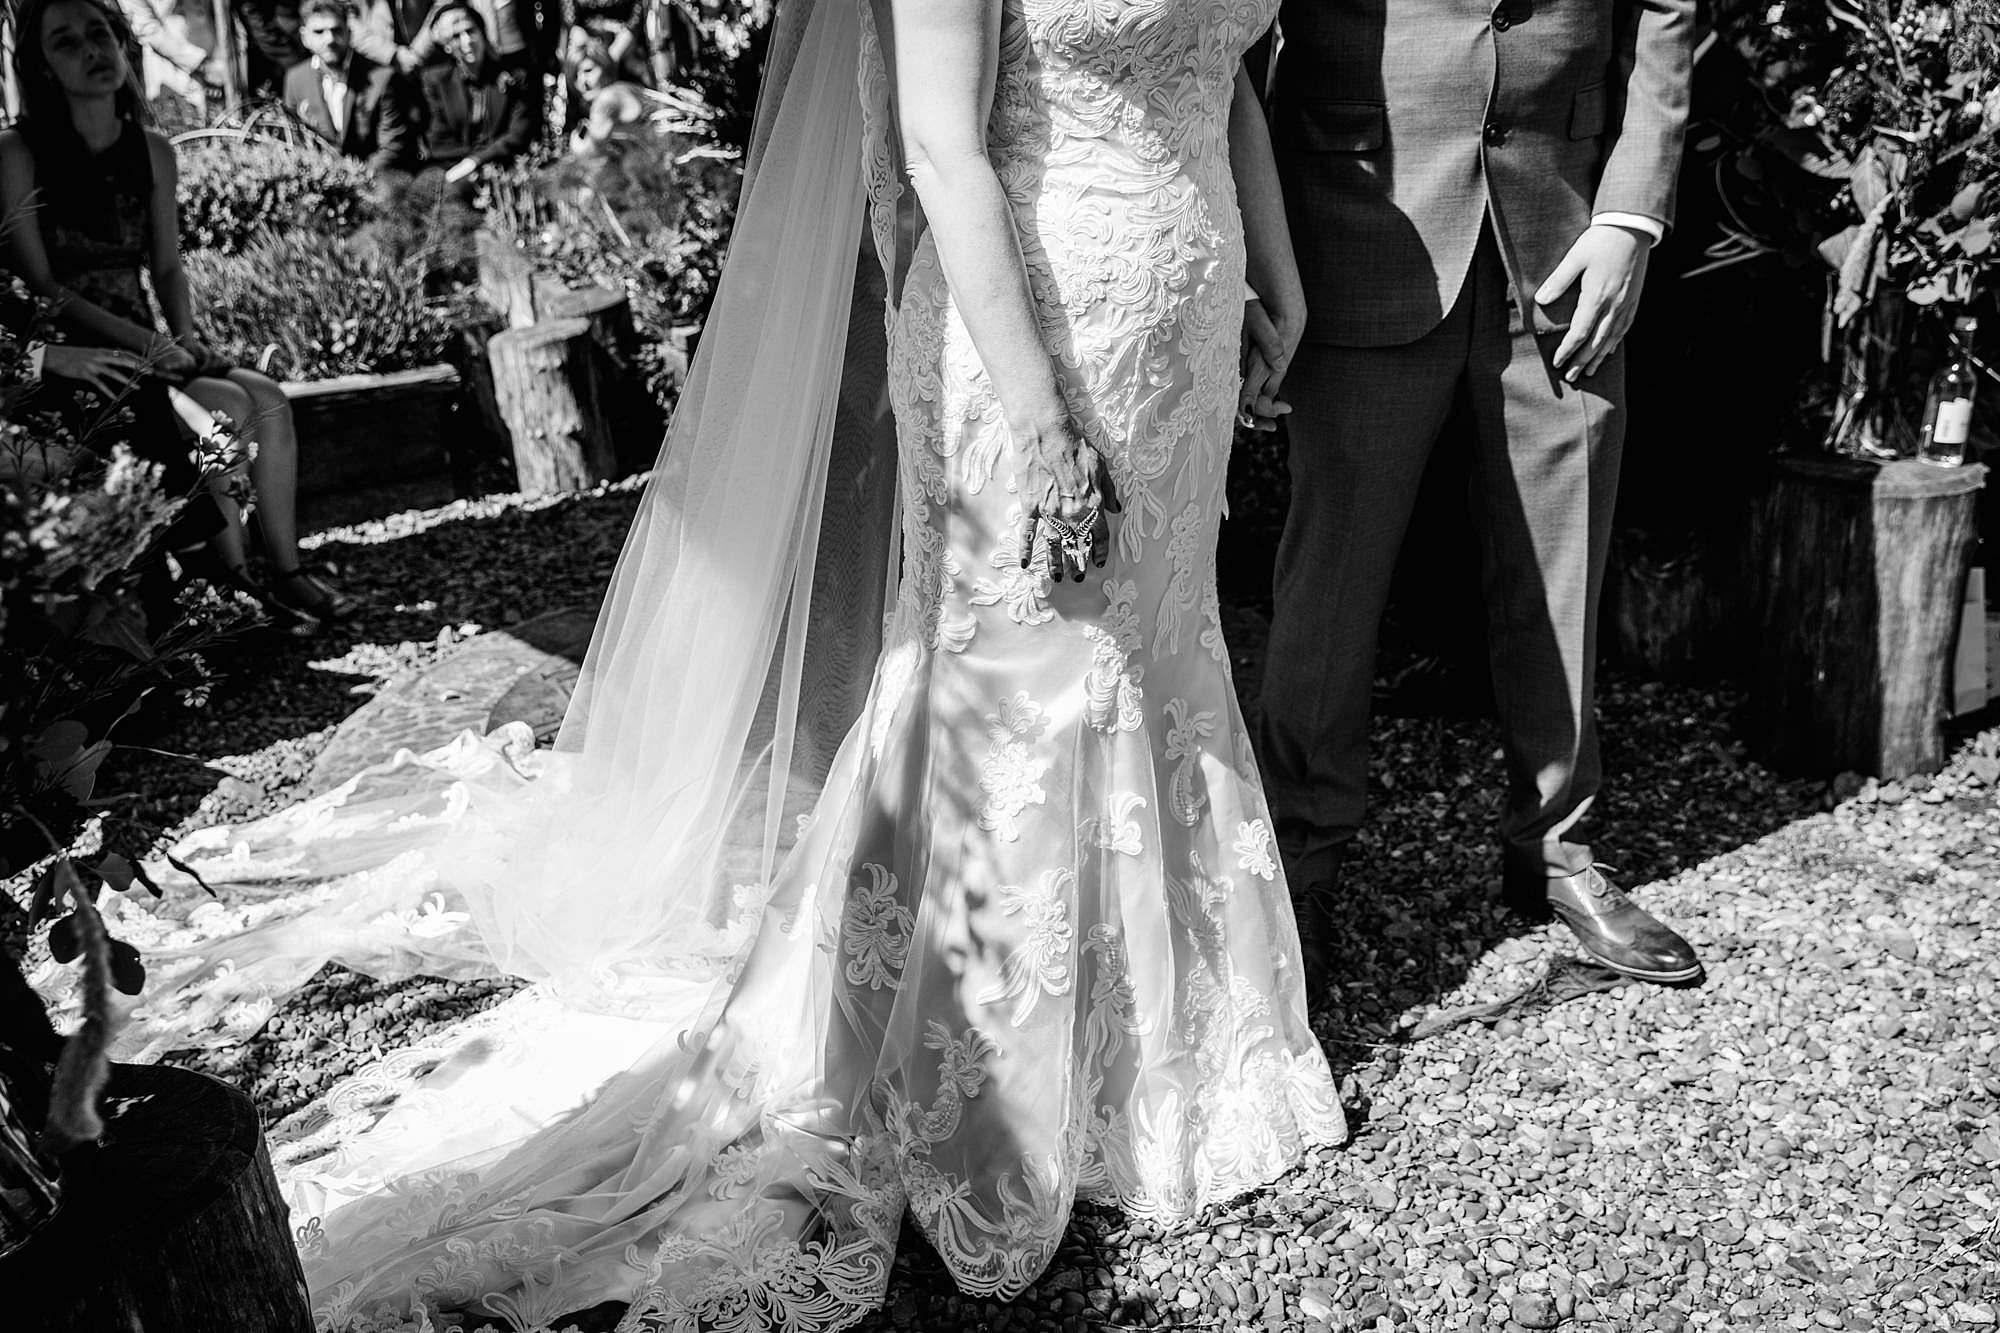 Brunel museum wedding bride and groom hold hands in ceremony